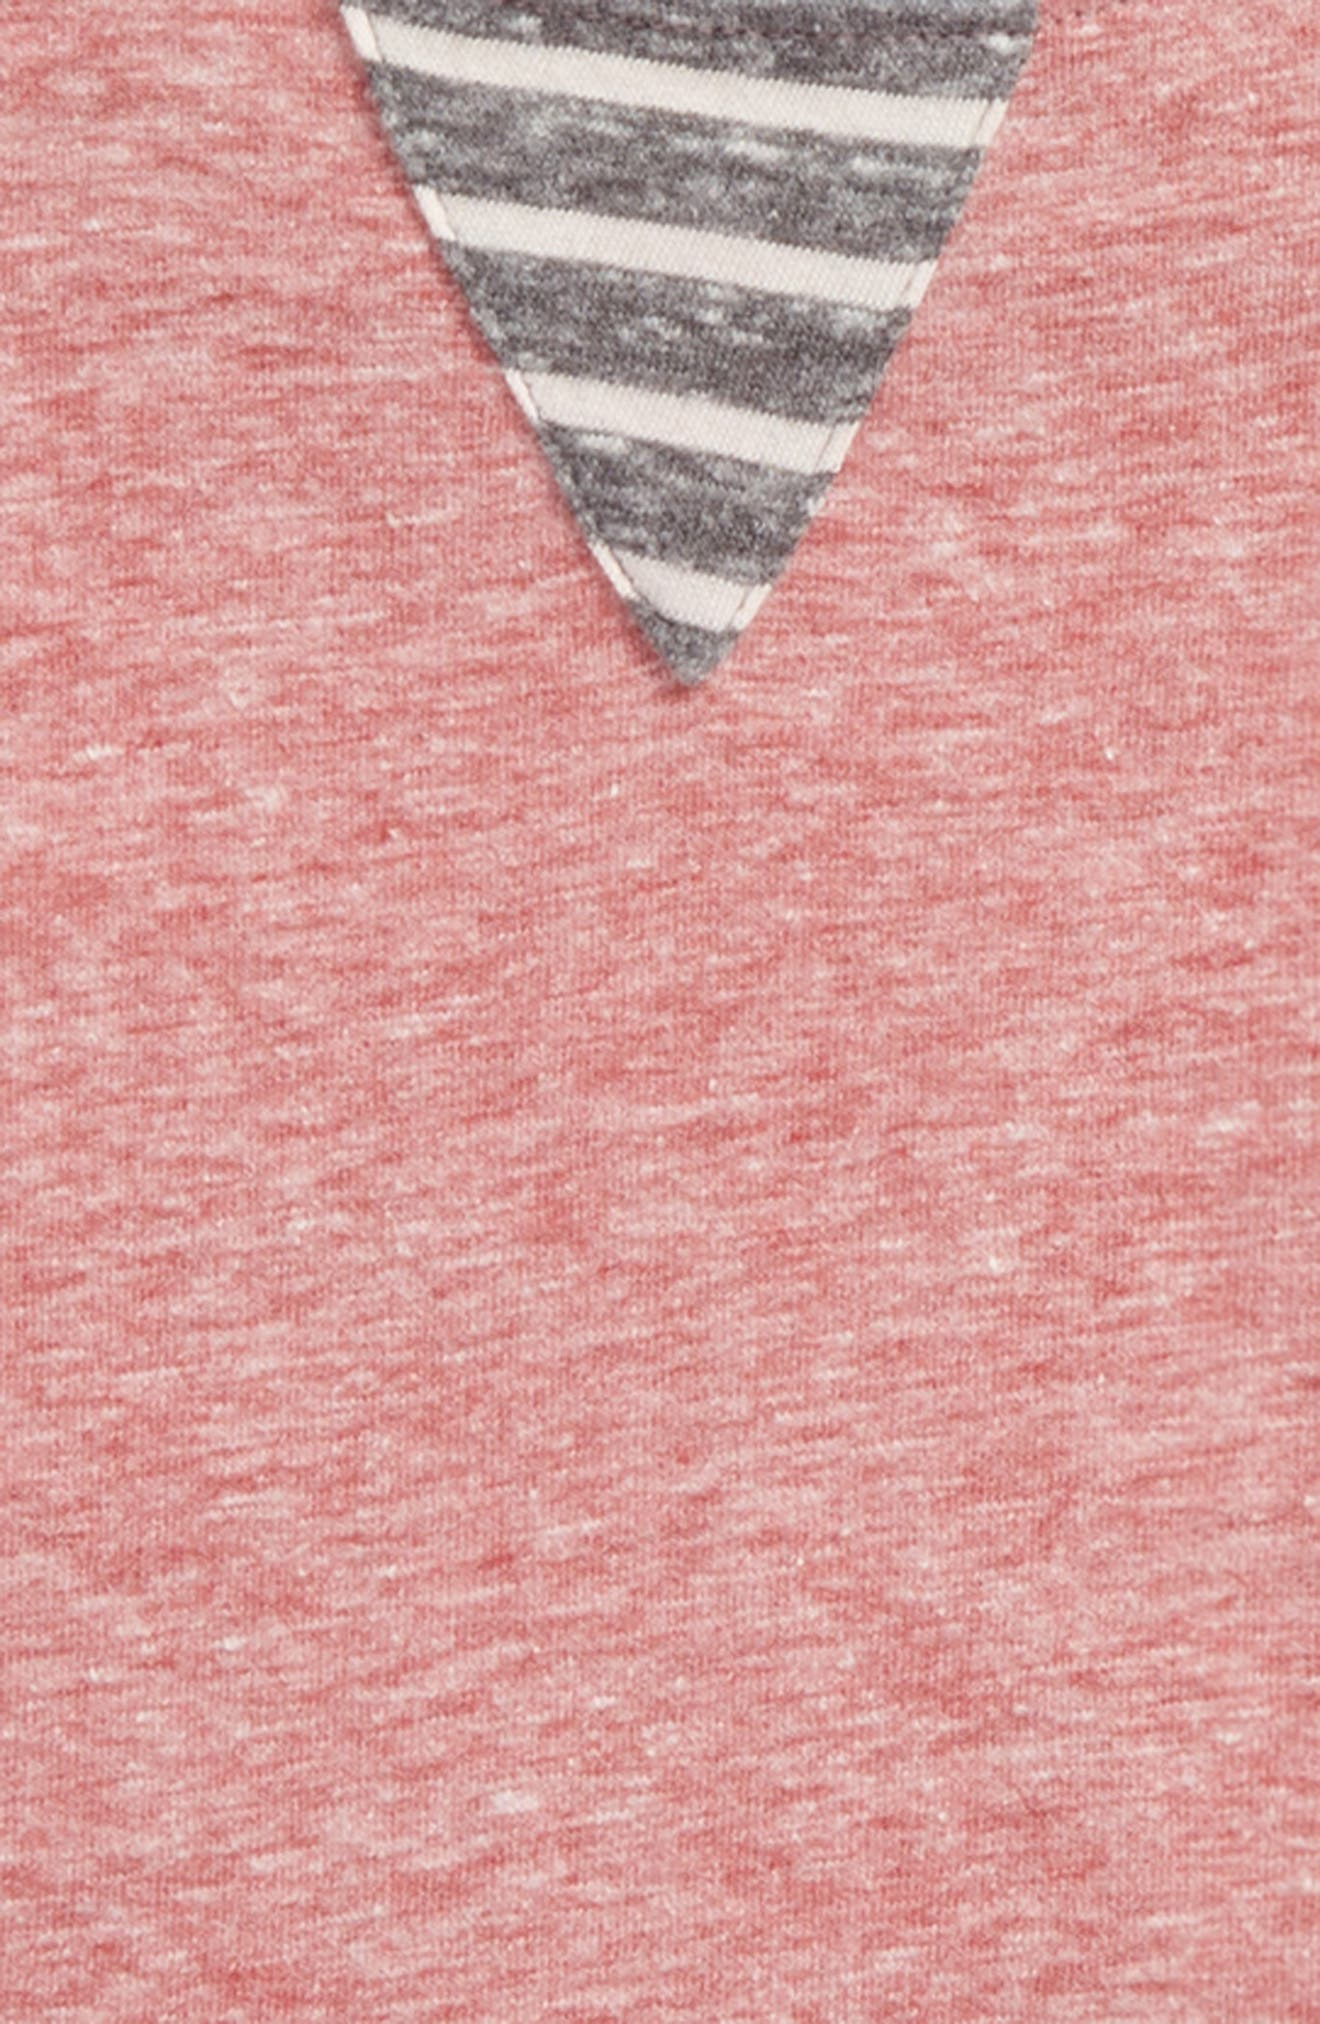 Ryker T-Shirt,                             Alternate thumbnail 3, color,                             600